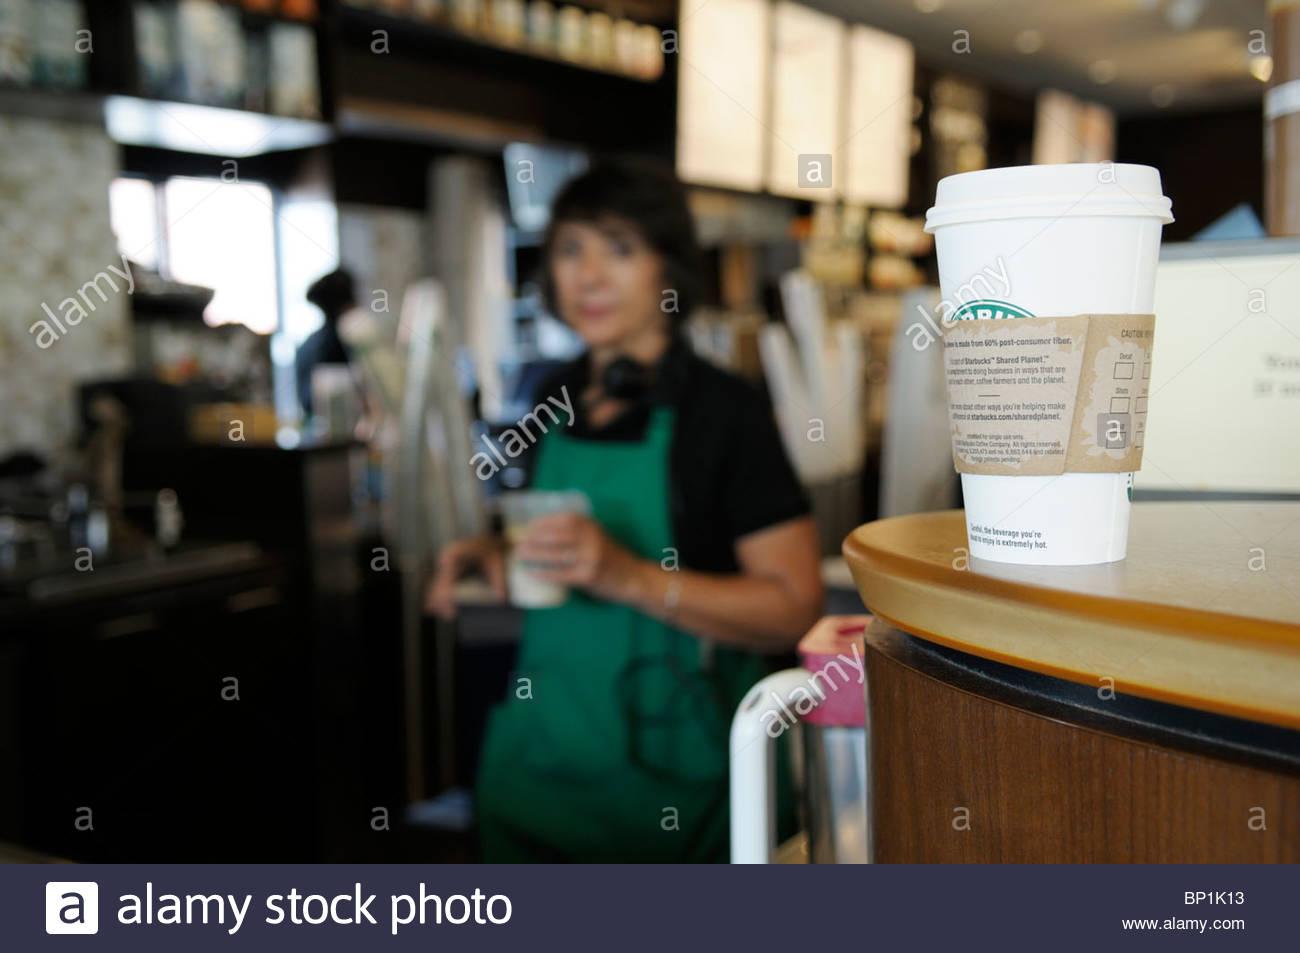 Starbucks dating kunder someecards dating min Ex